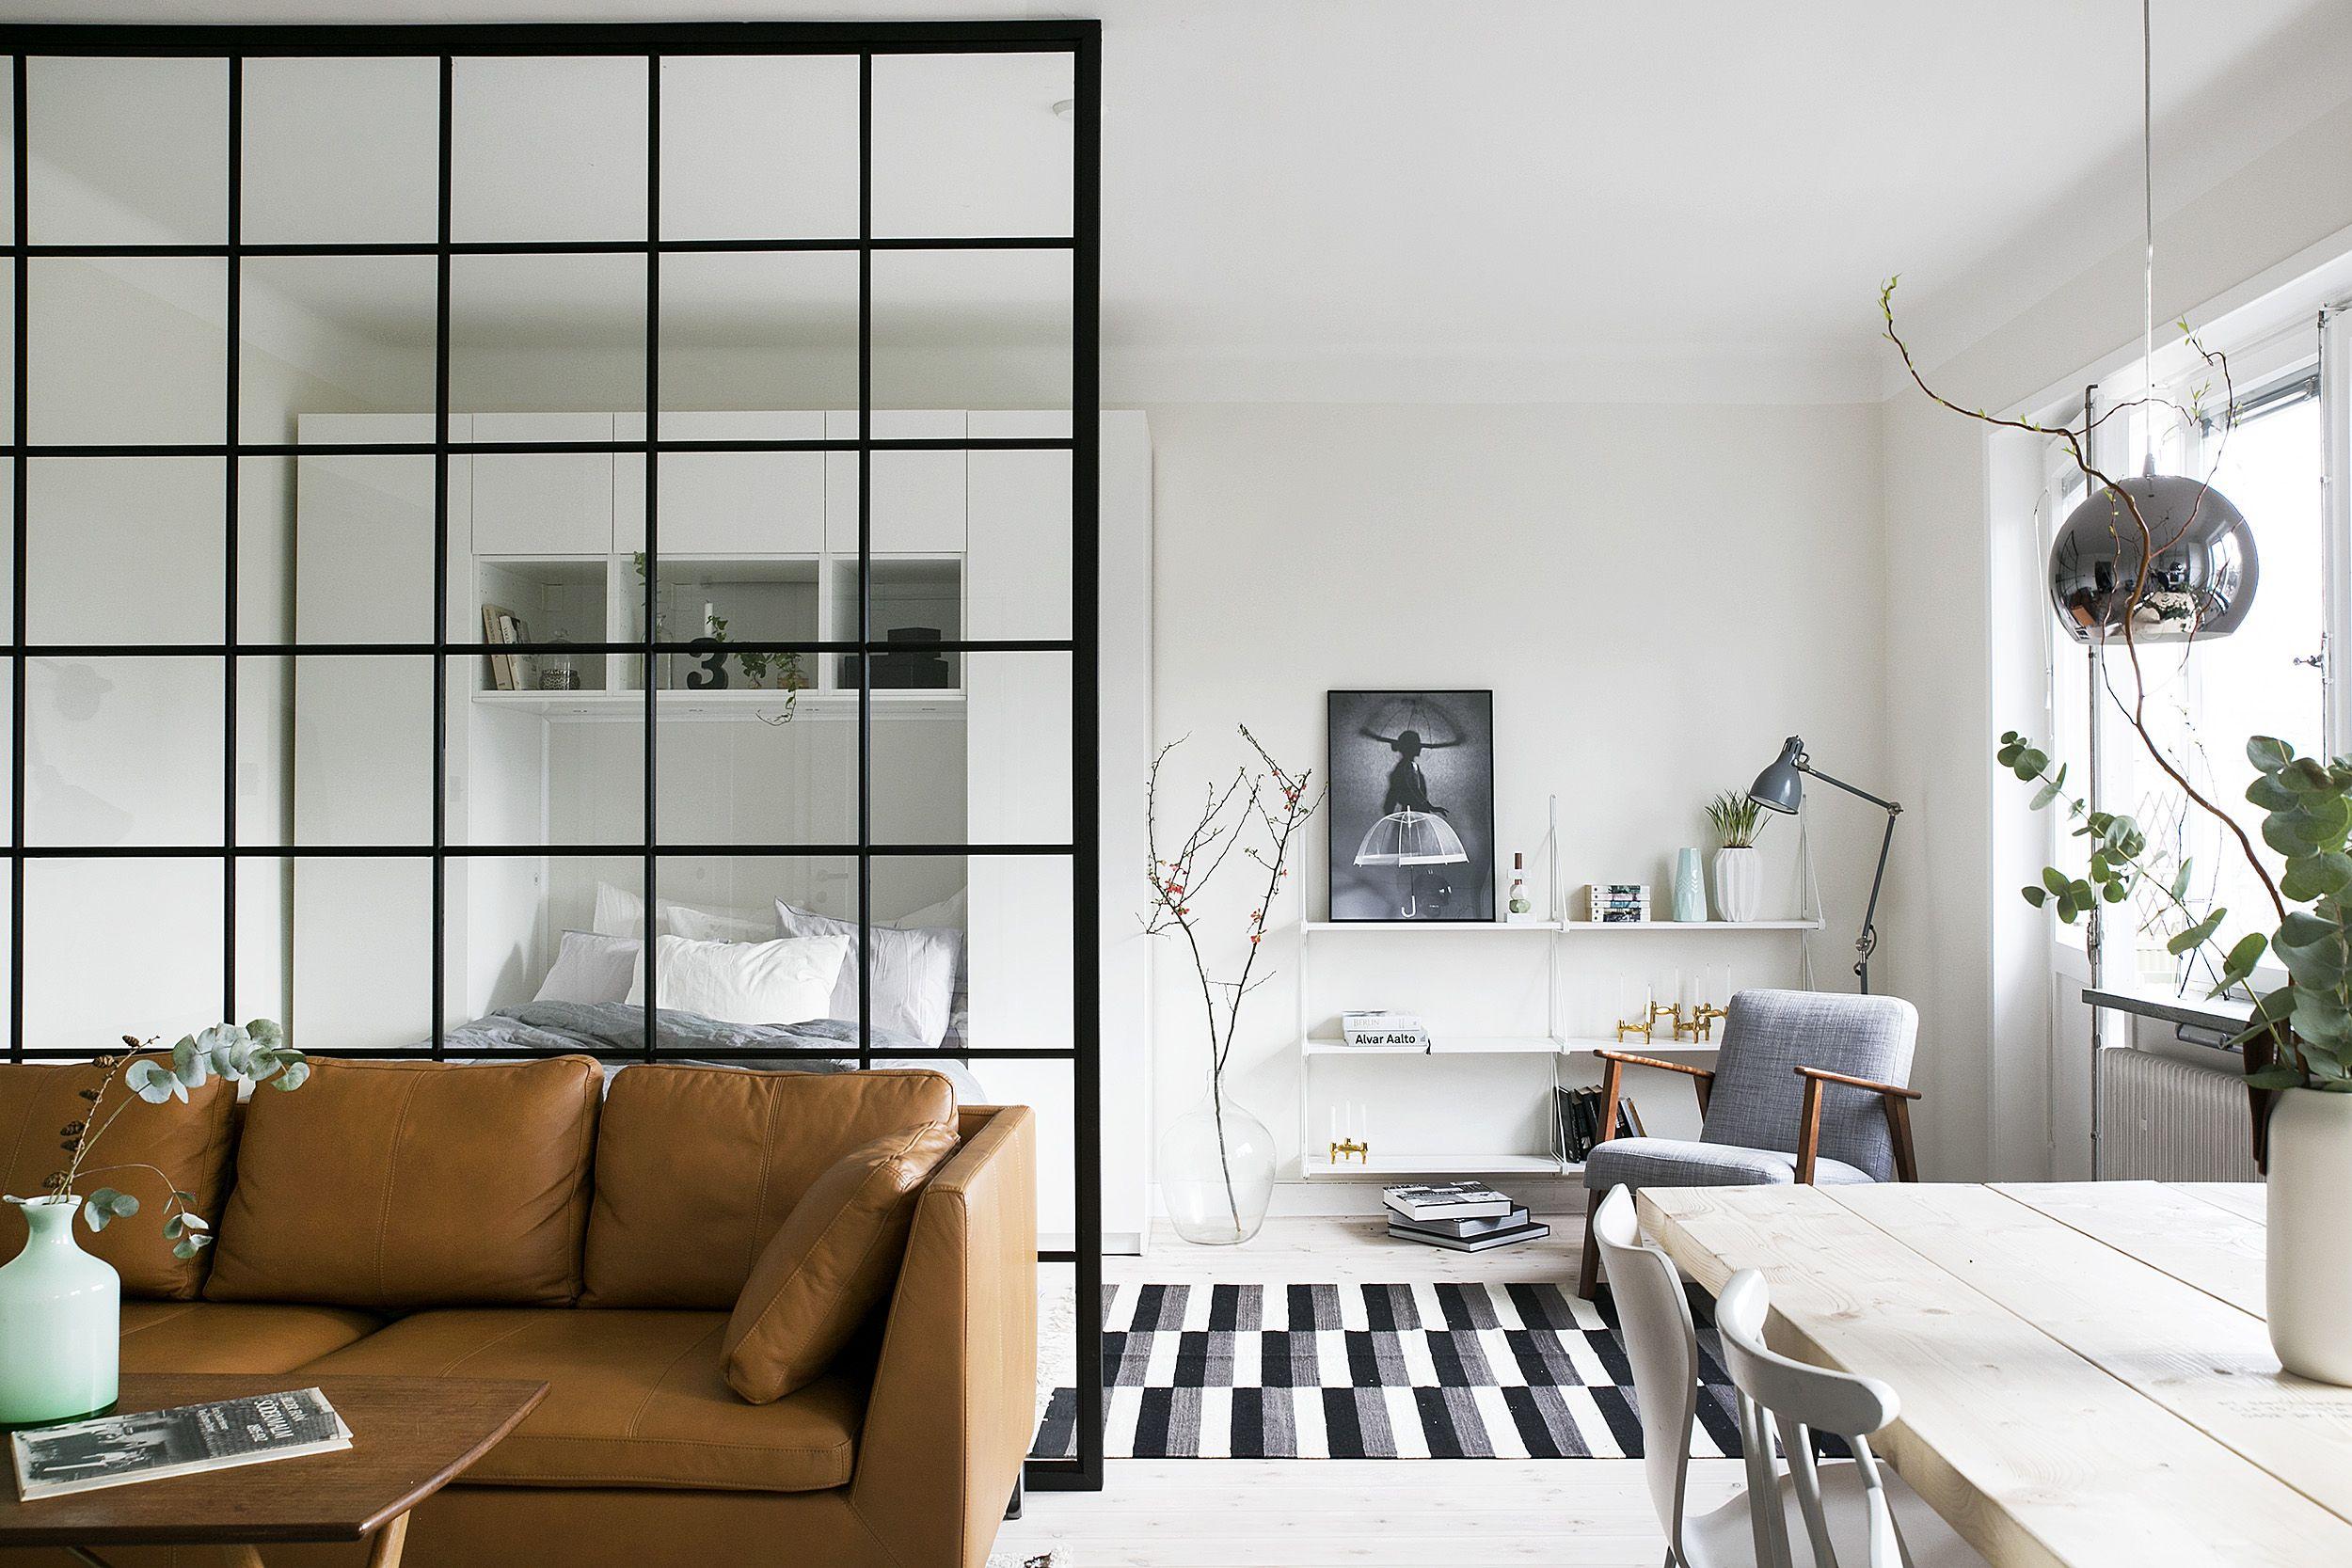 20 small house interior